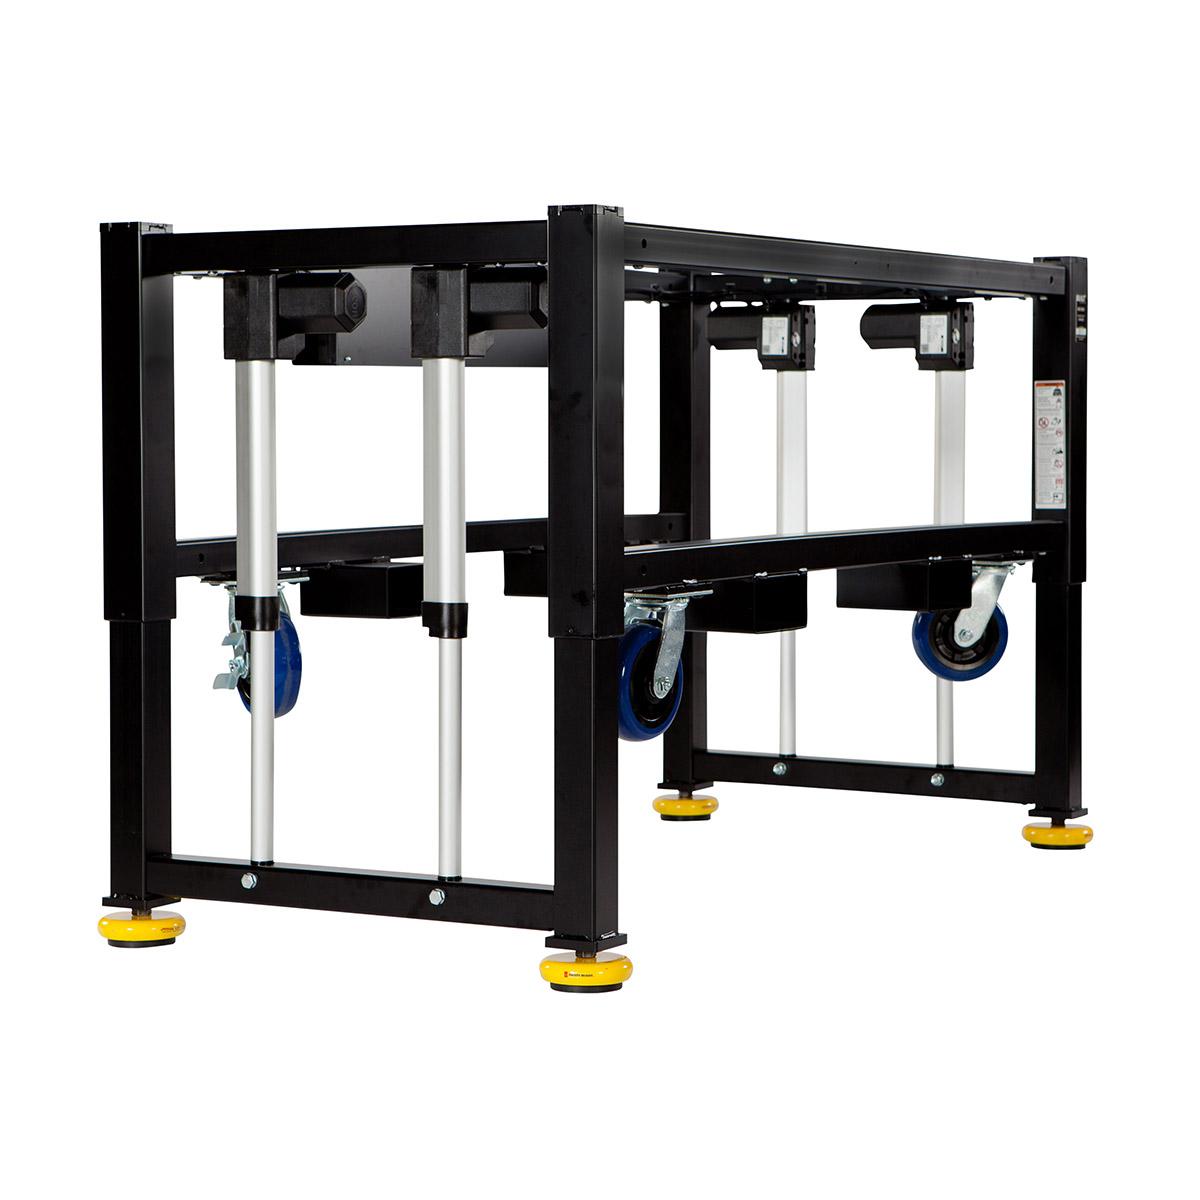 Machine base built durable and ergonomic